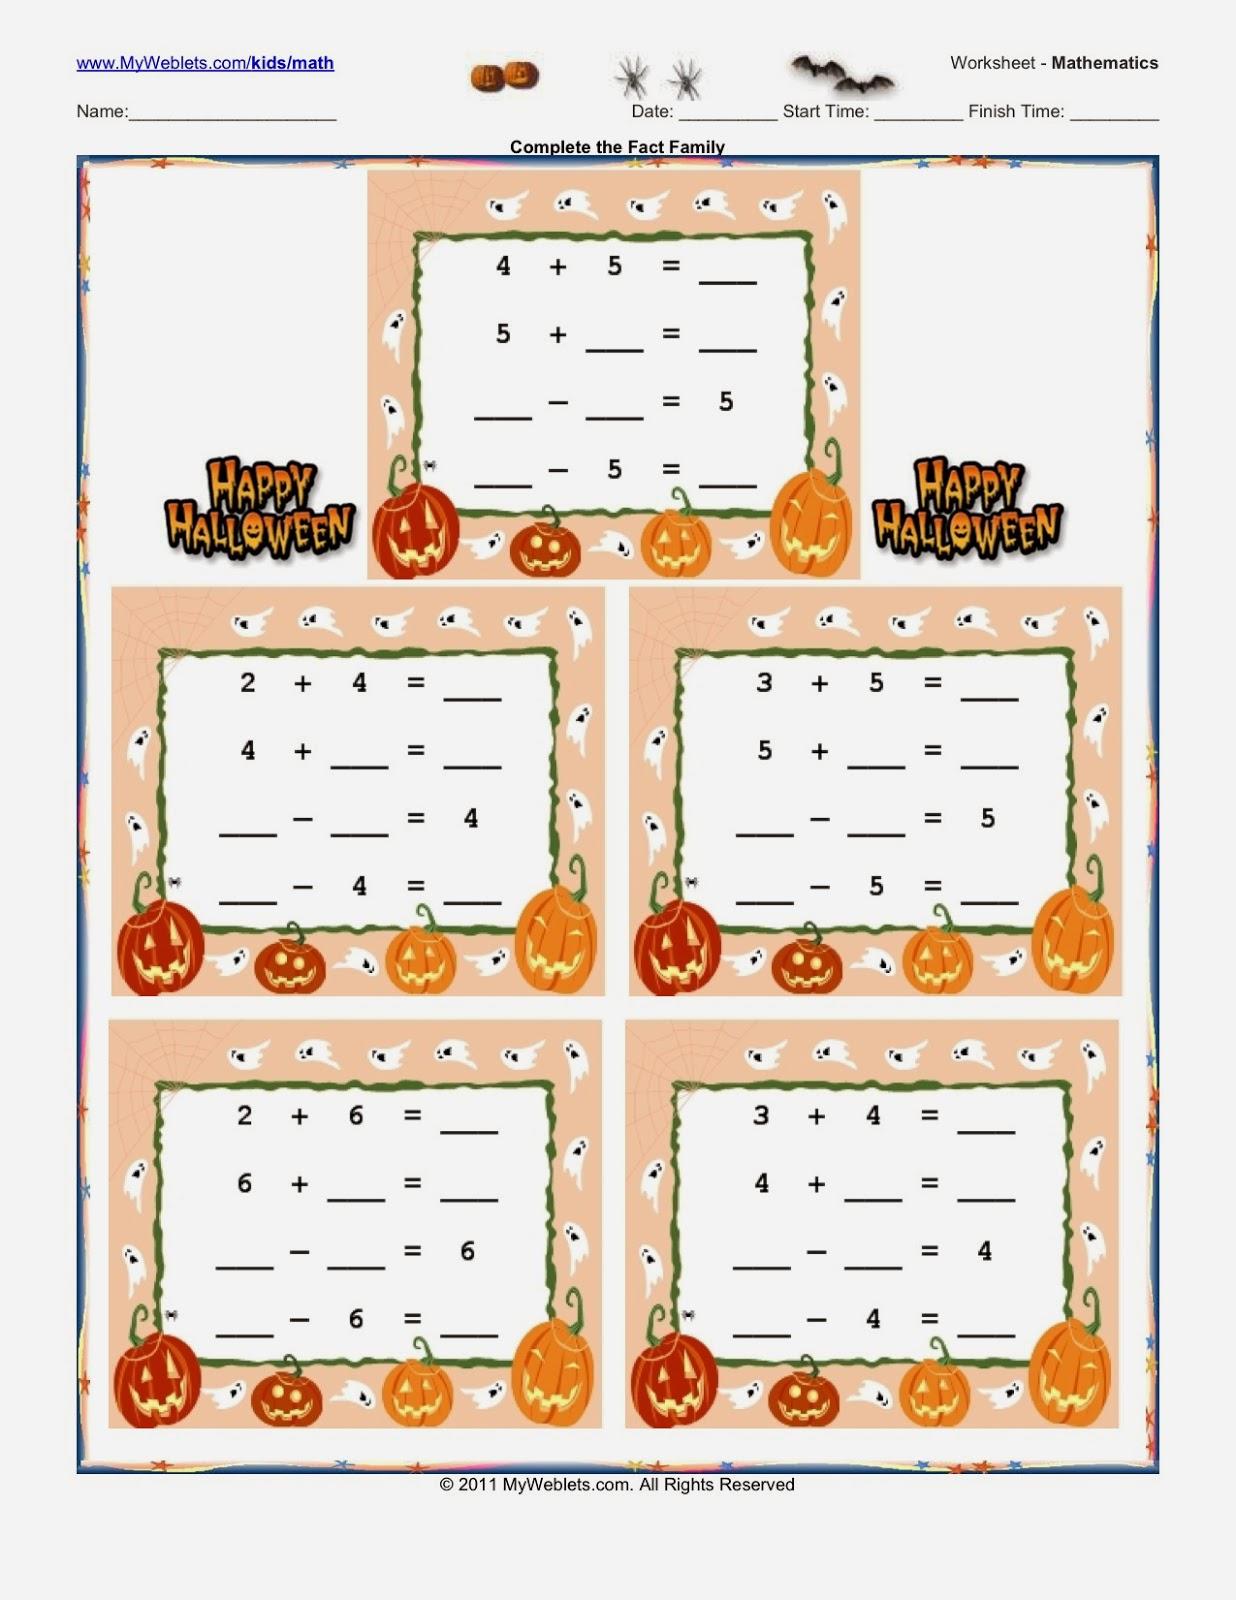 Mathmarsha Blog Preparing For A Halloween Math Parent